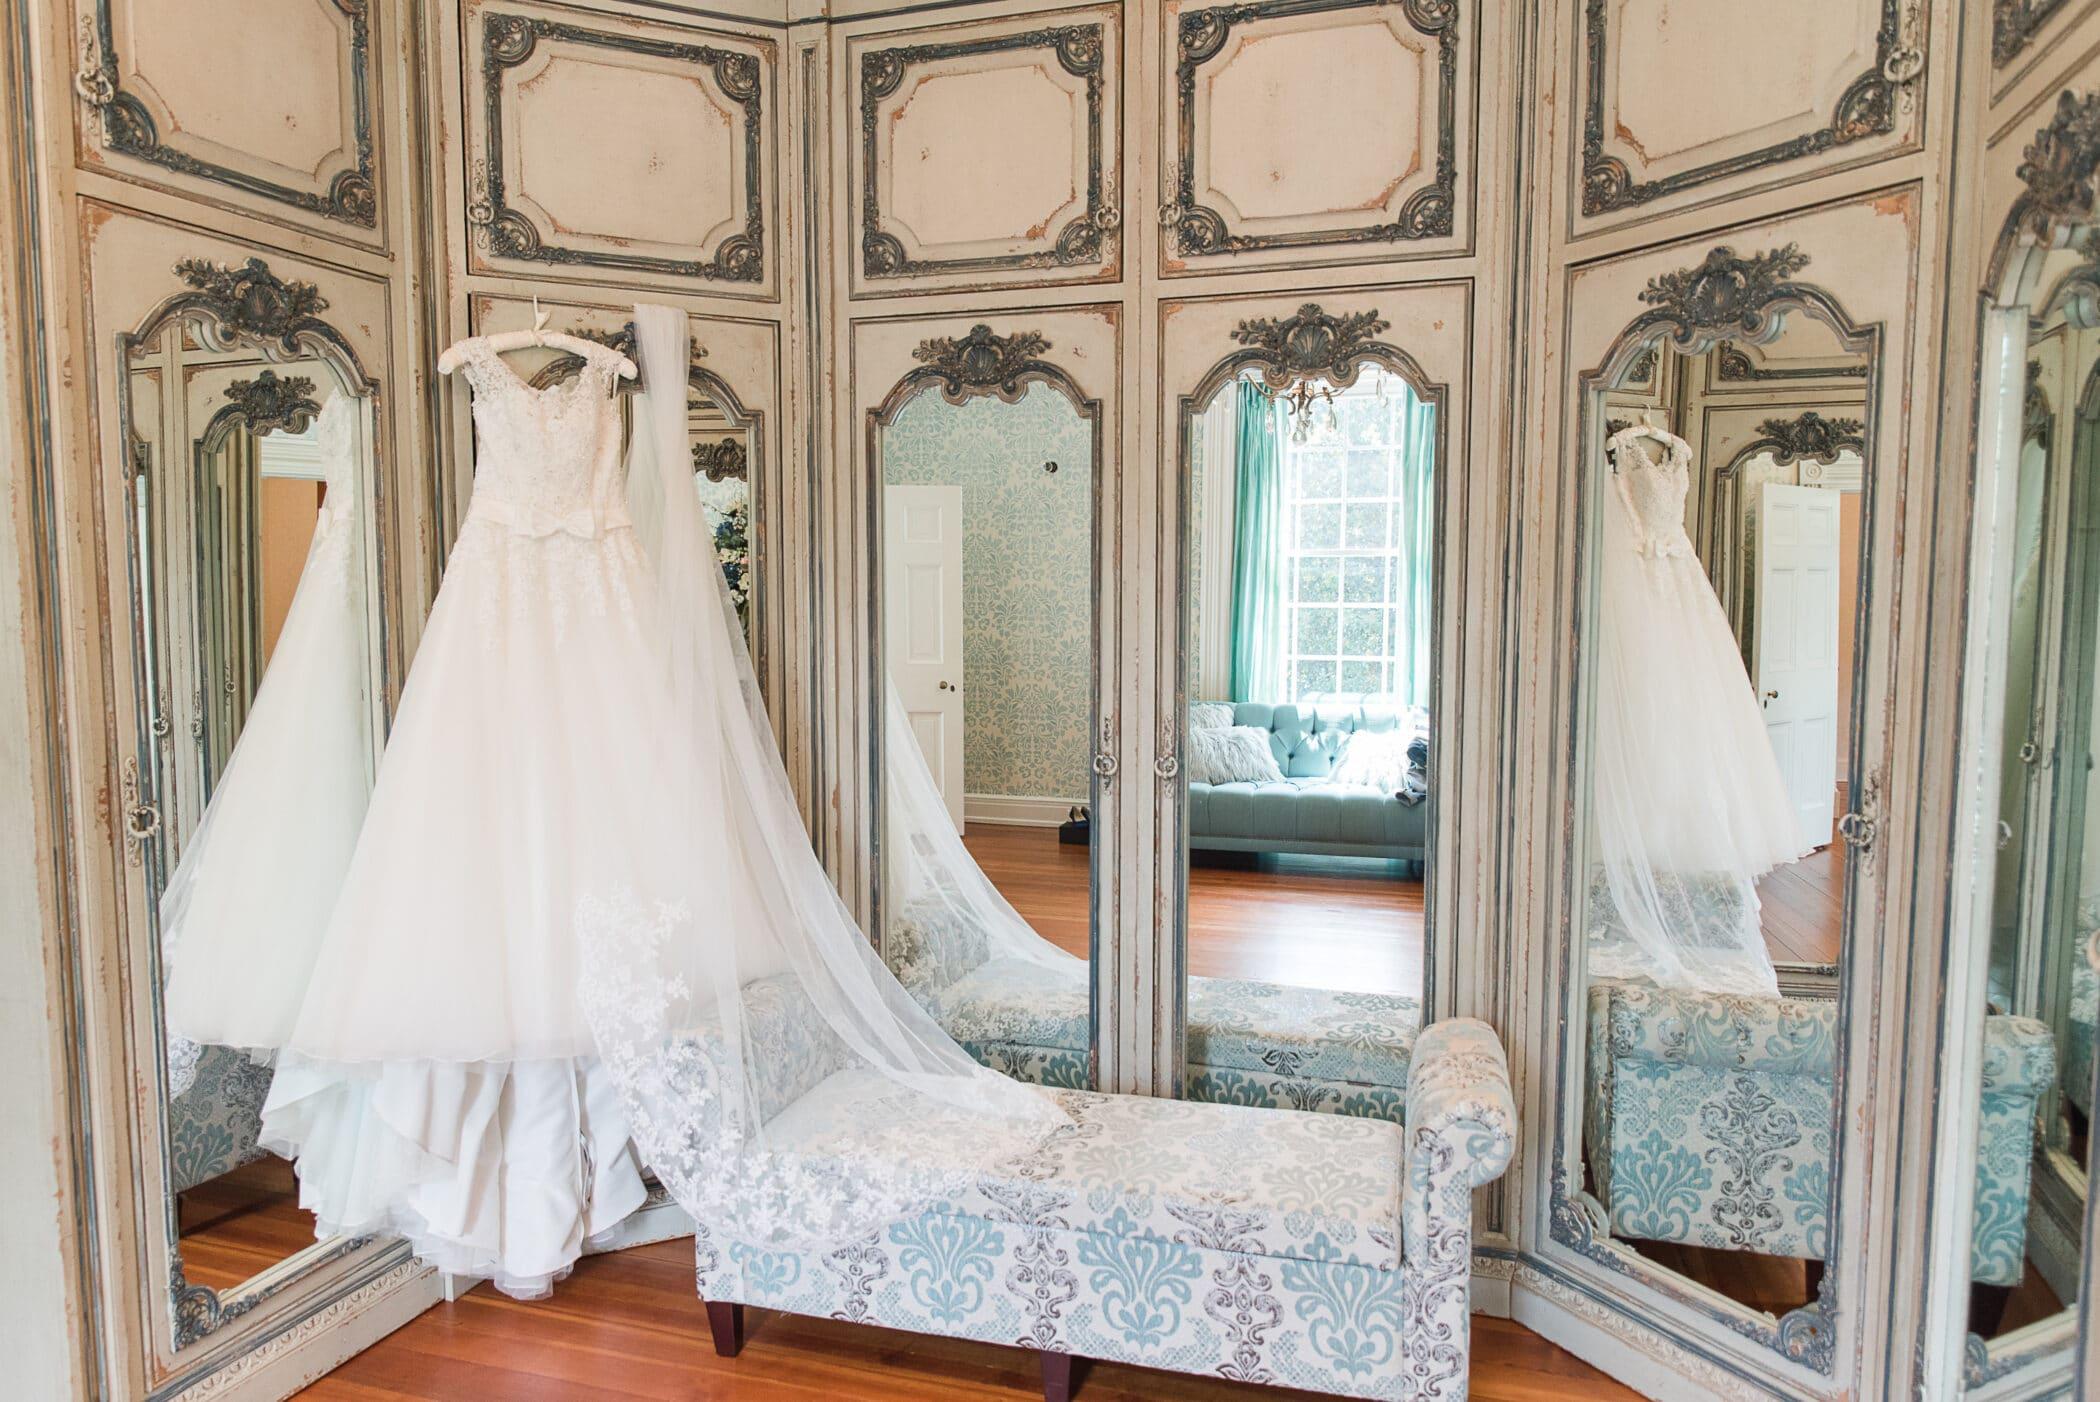 Selecting Your Virginia Wedding Venue | Entwined Events | Venue: Bella Rose Plantation in Lynchburg, VA | Photo Credit: Karen Nicole Photography